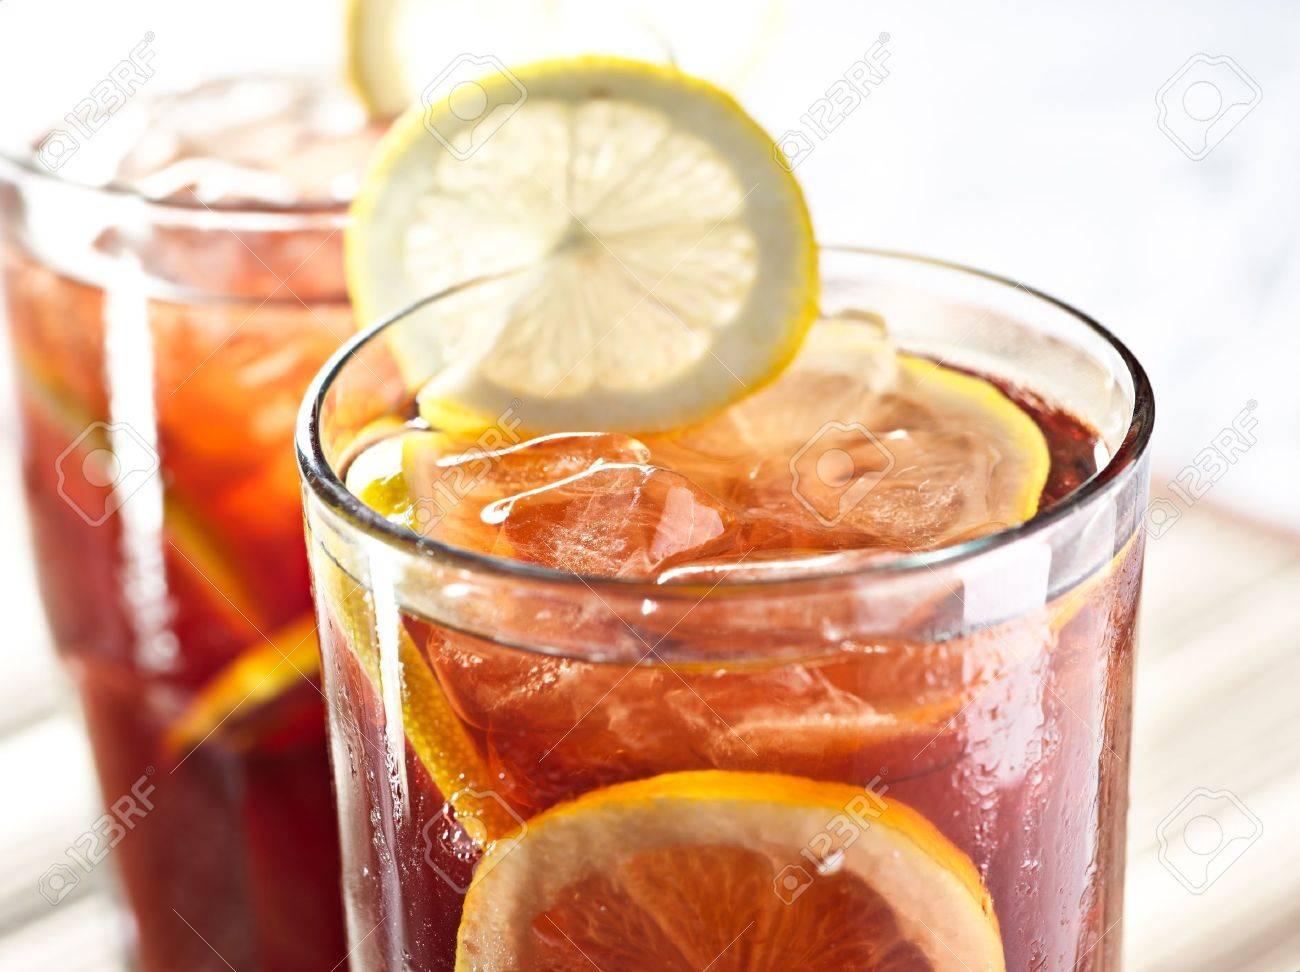 two glasses of iced tea with lemon garnish closeup Stock Photo - 12925050